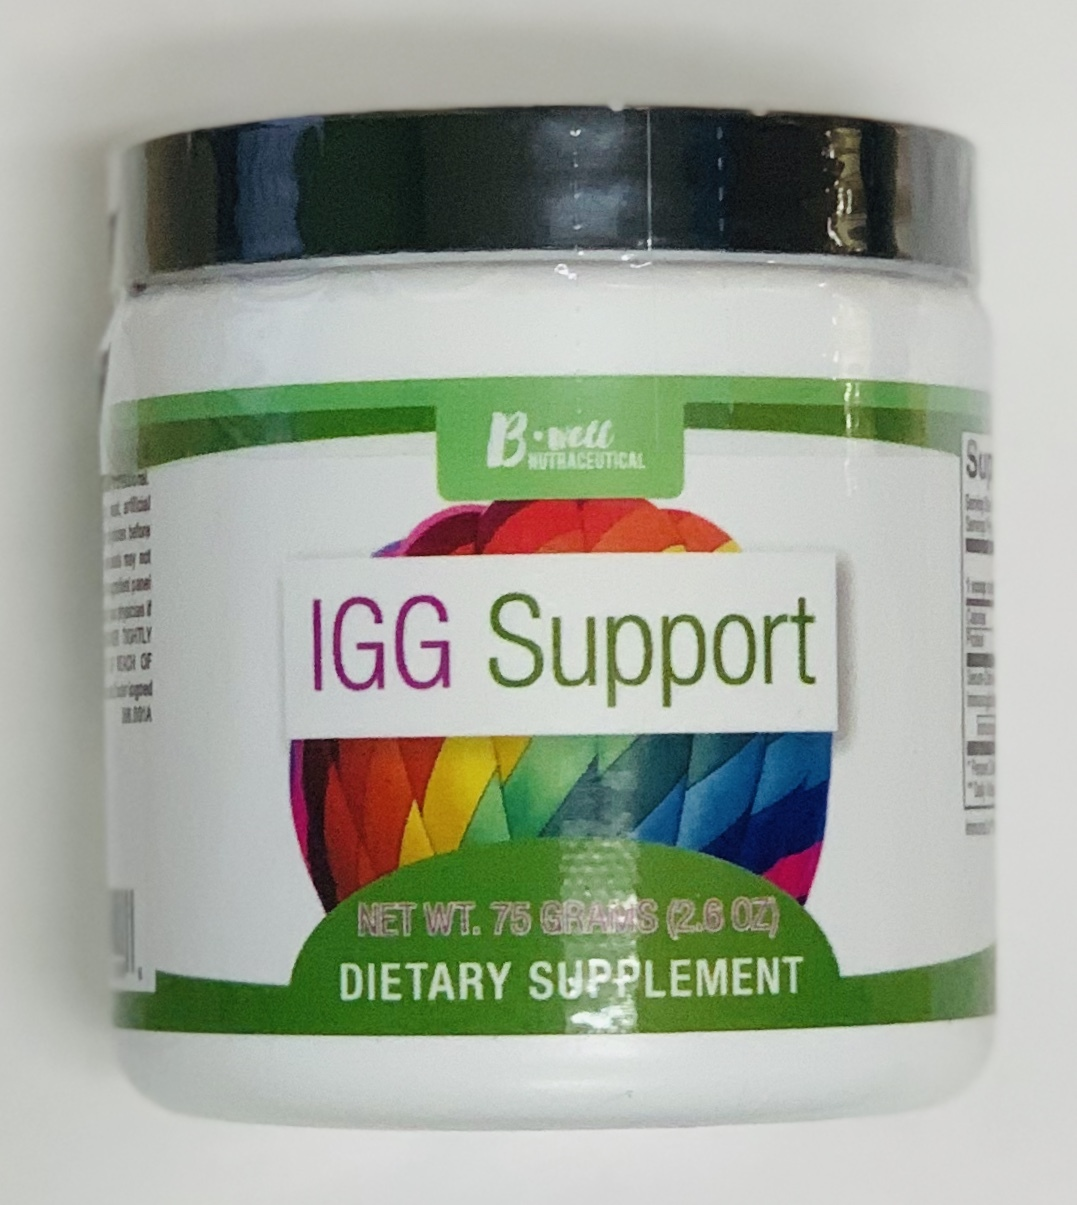 IGG Support 00184